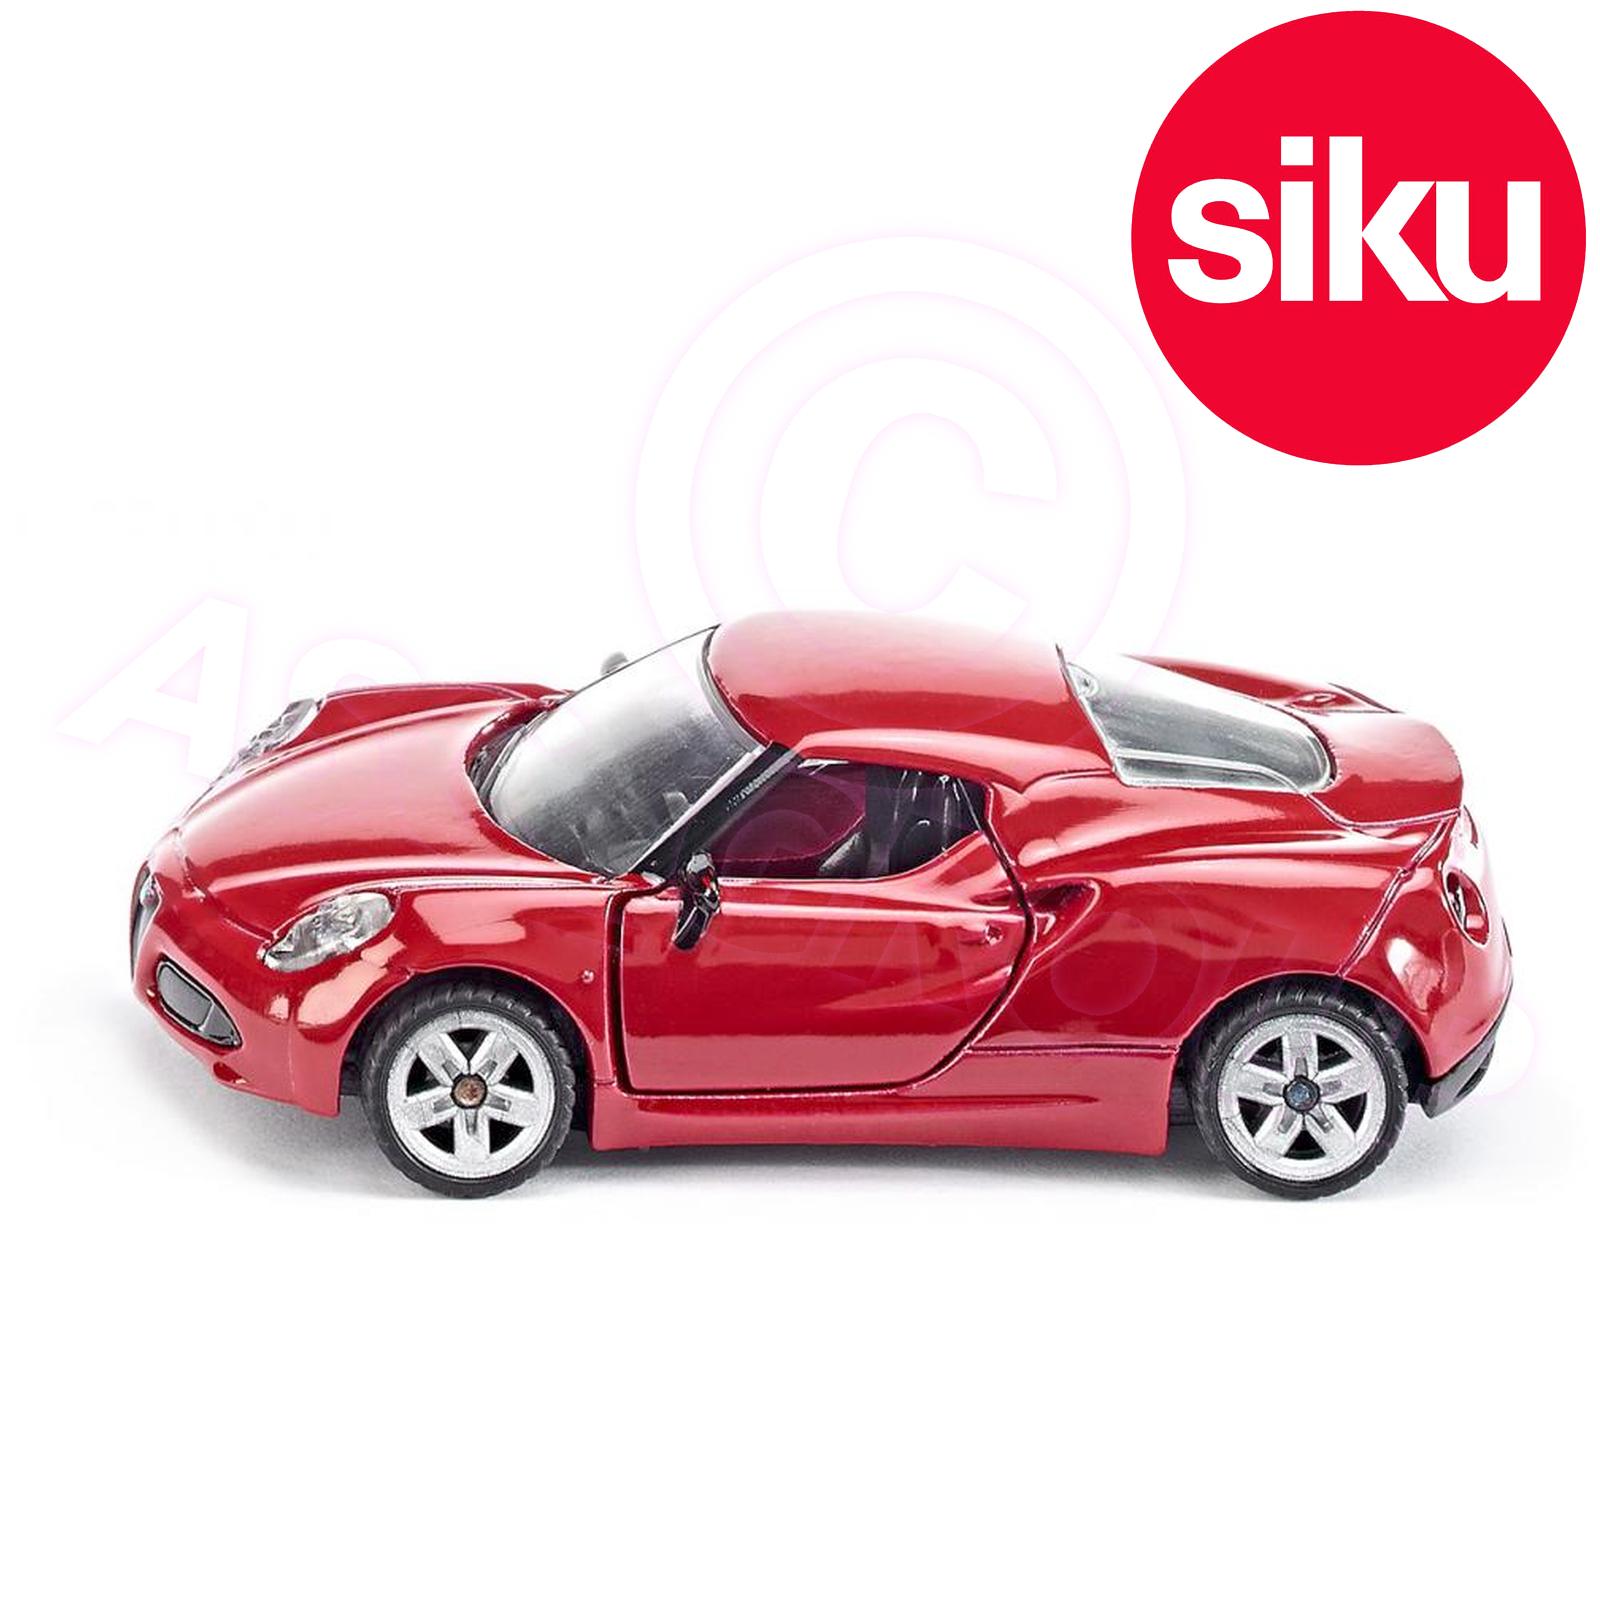 Siku No 1451 Alfa Romeo 4C SportsCar Dicast Metal Model